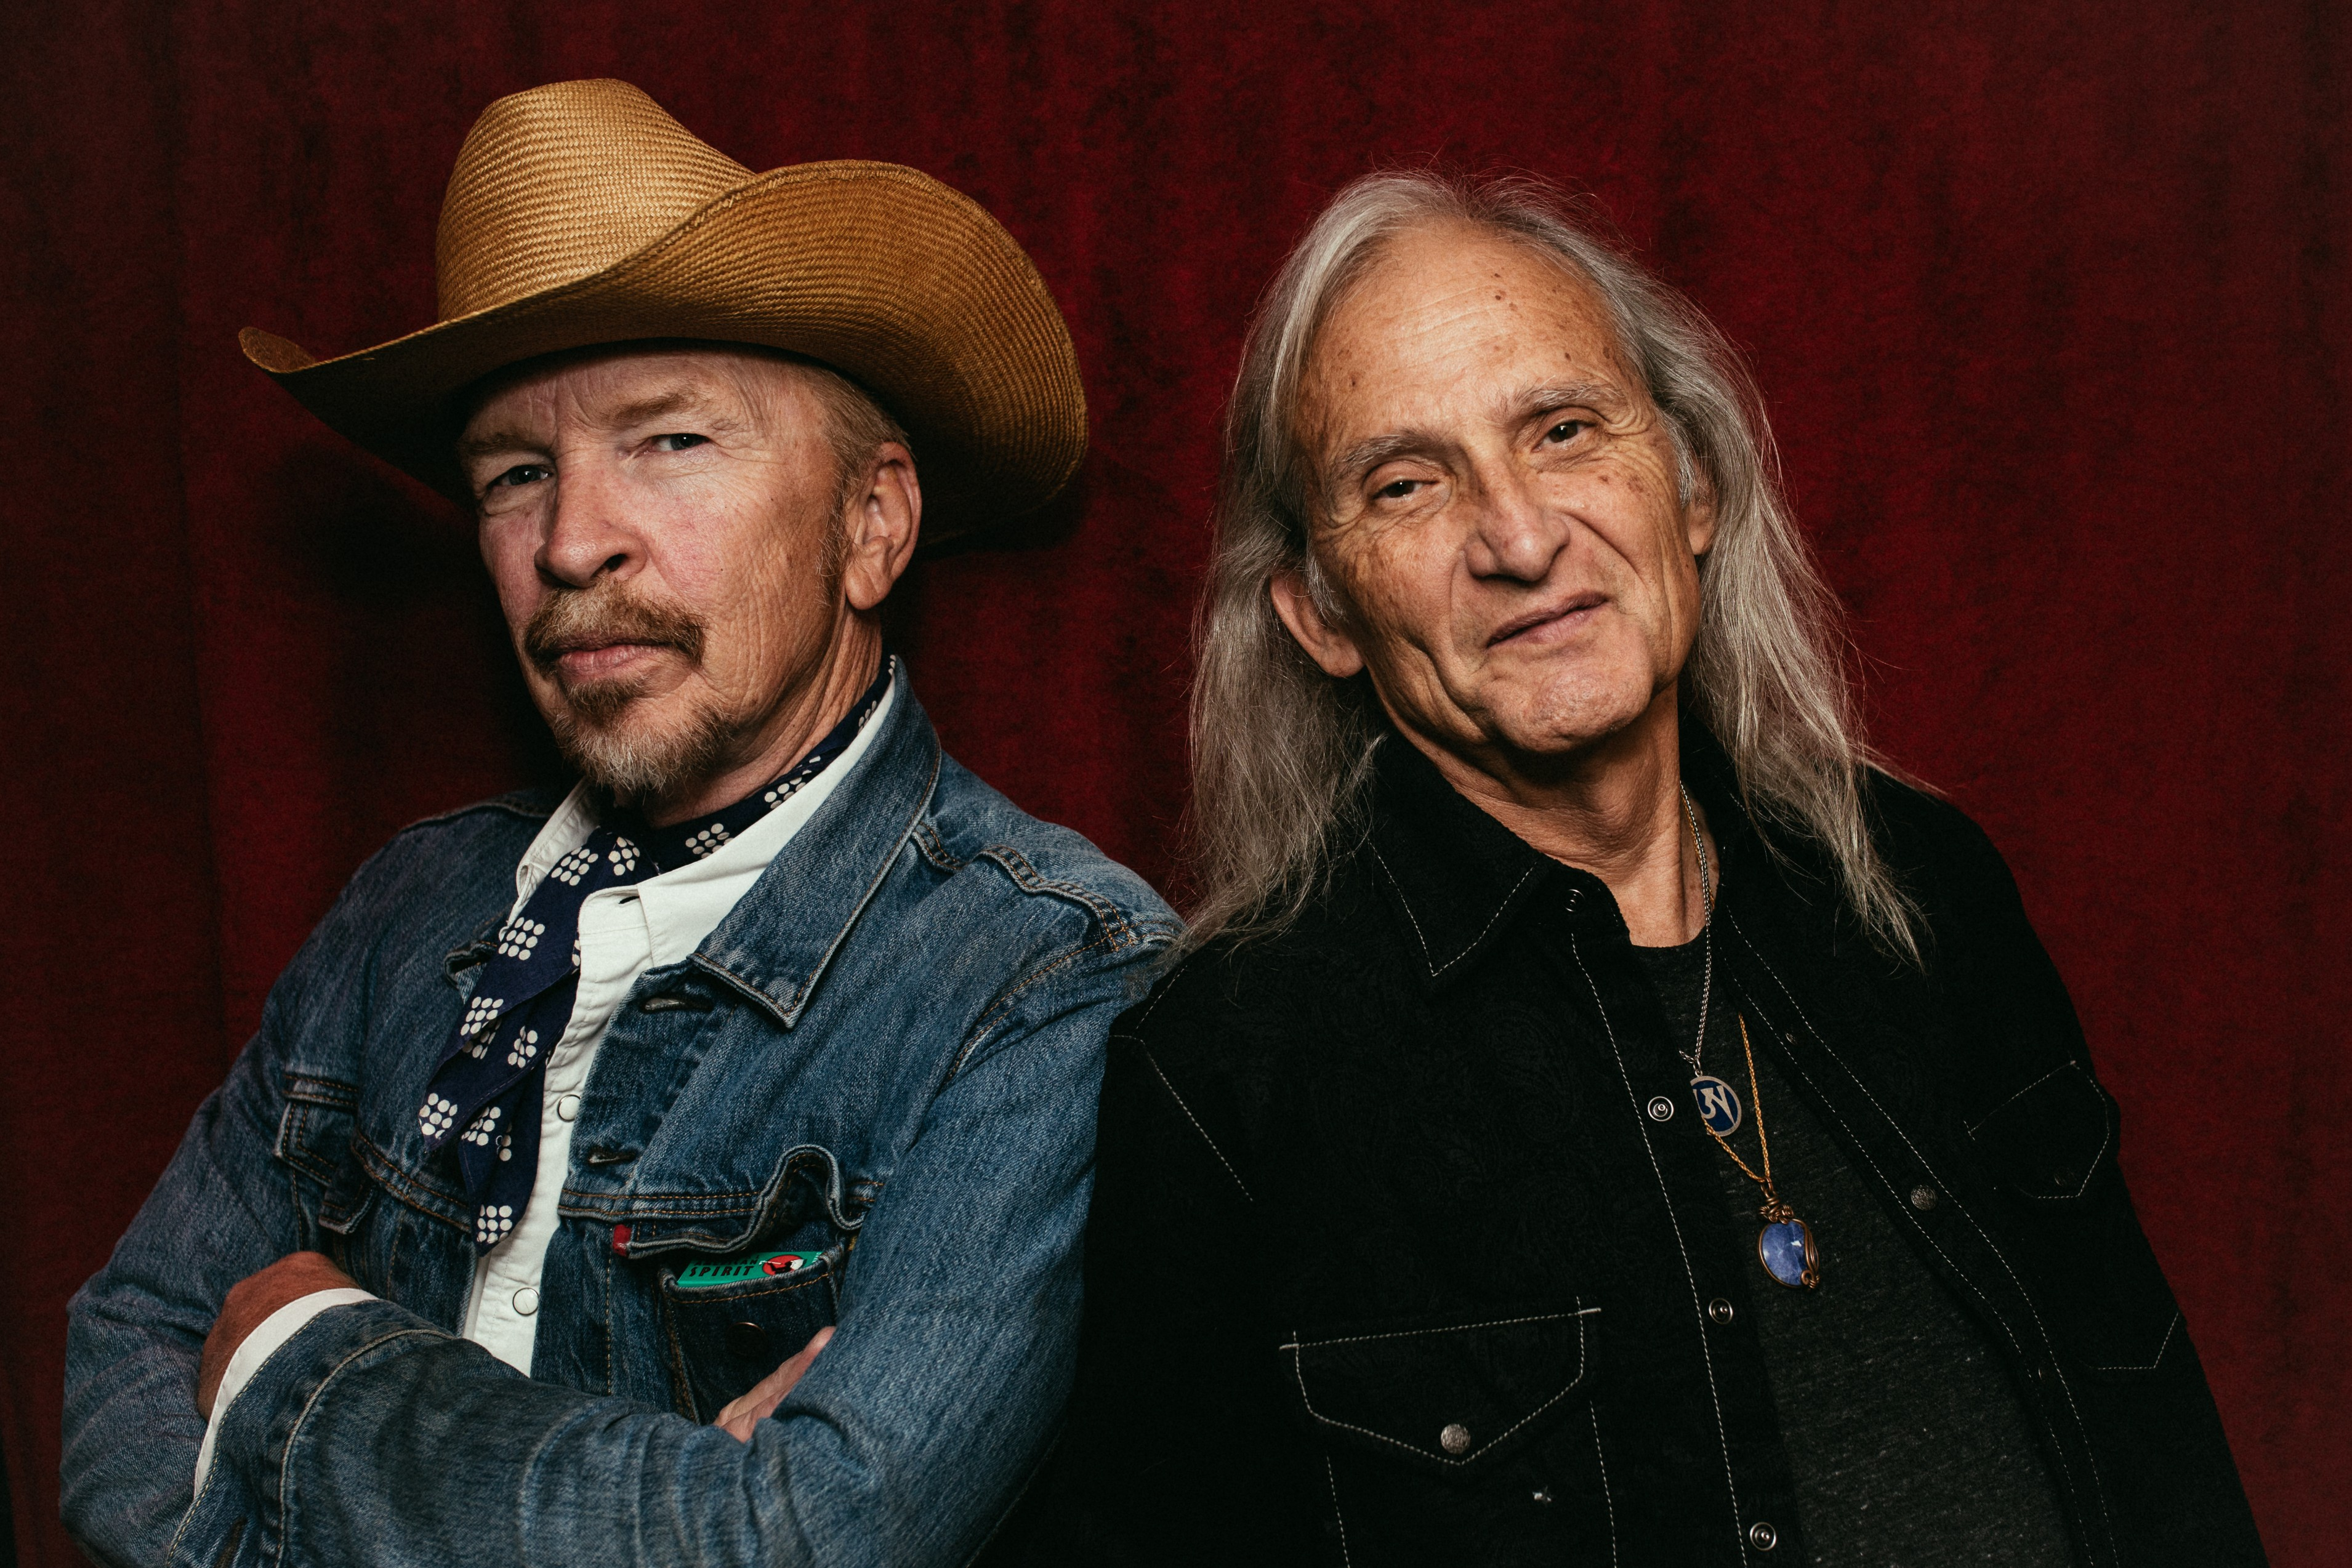 (L-R) Dave Alvin and Jimmie Dale Gilmore. Photo: Daniel Jackson